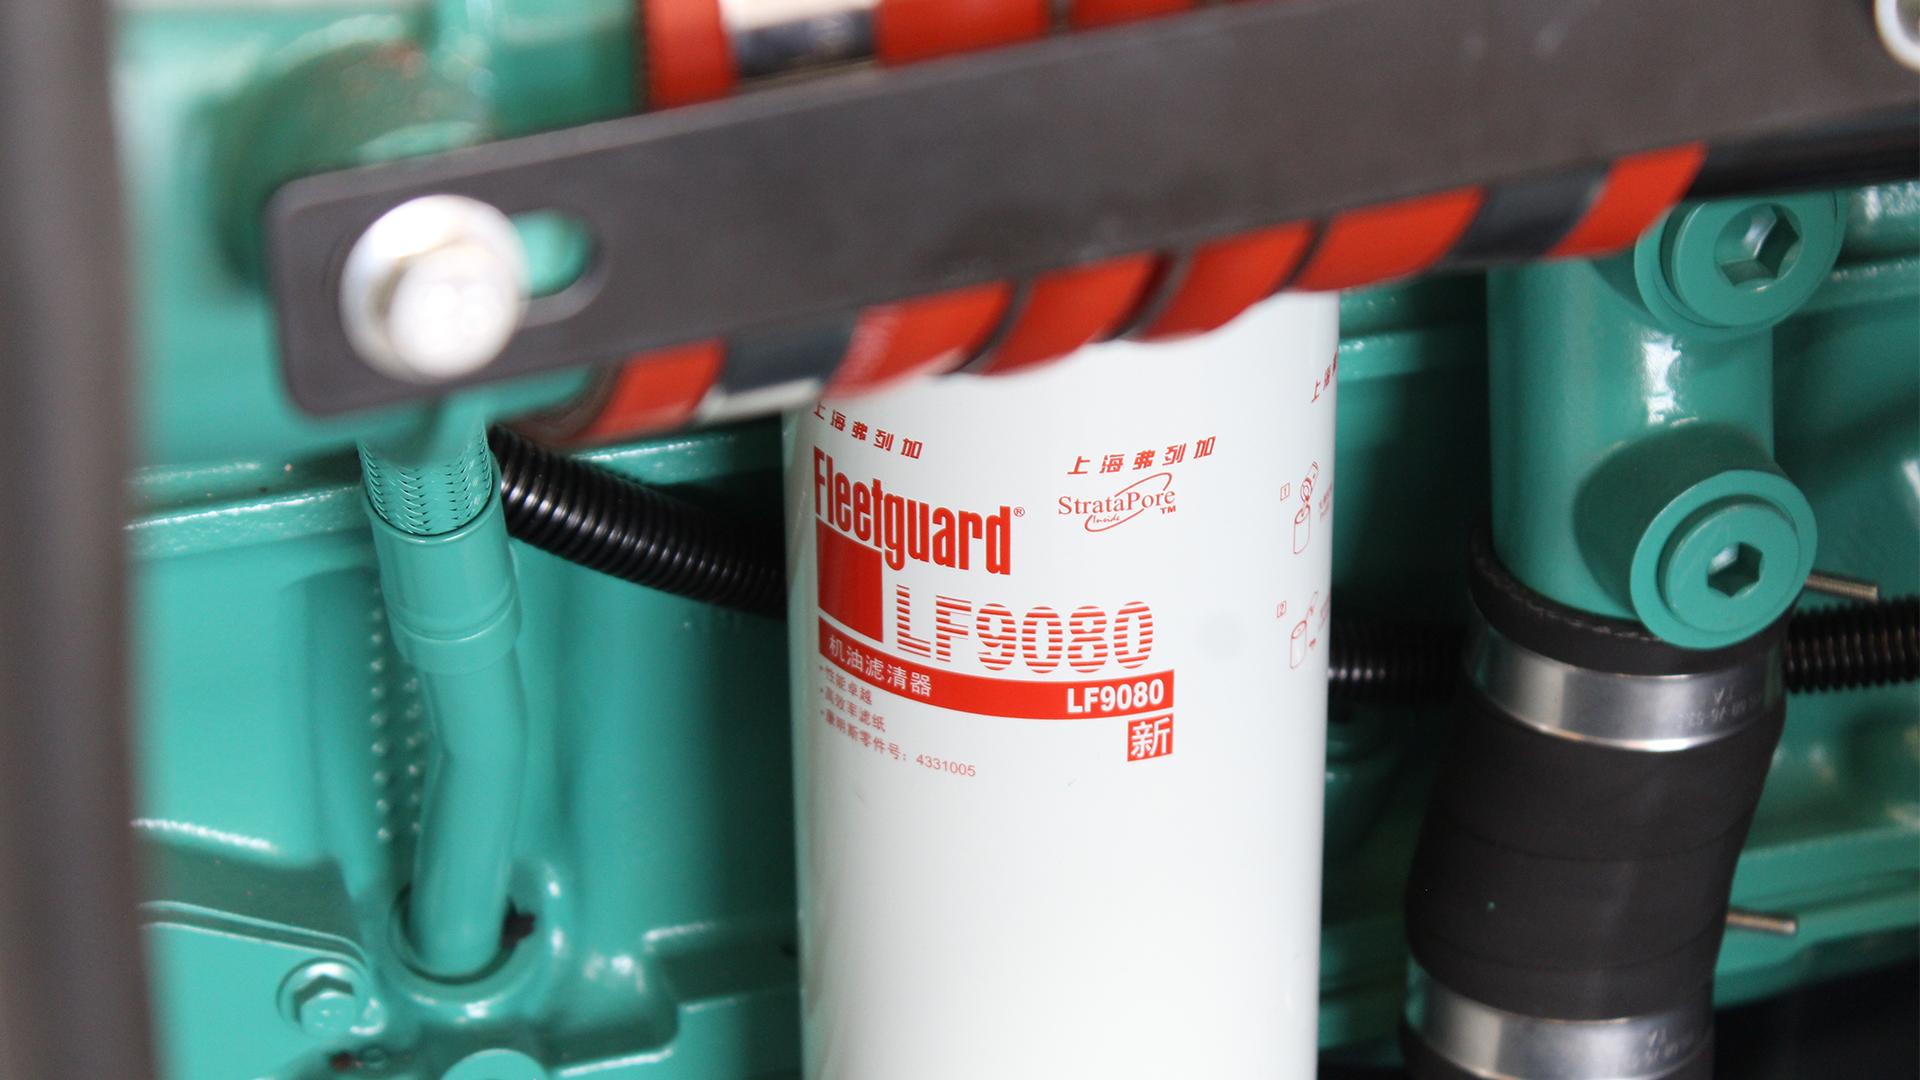 Fleetguard LF9080 filter on Cummins engine